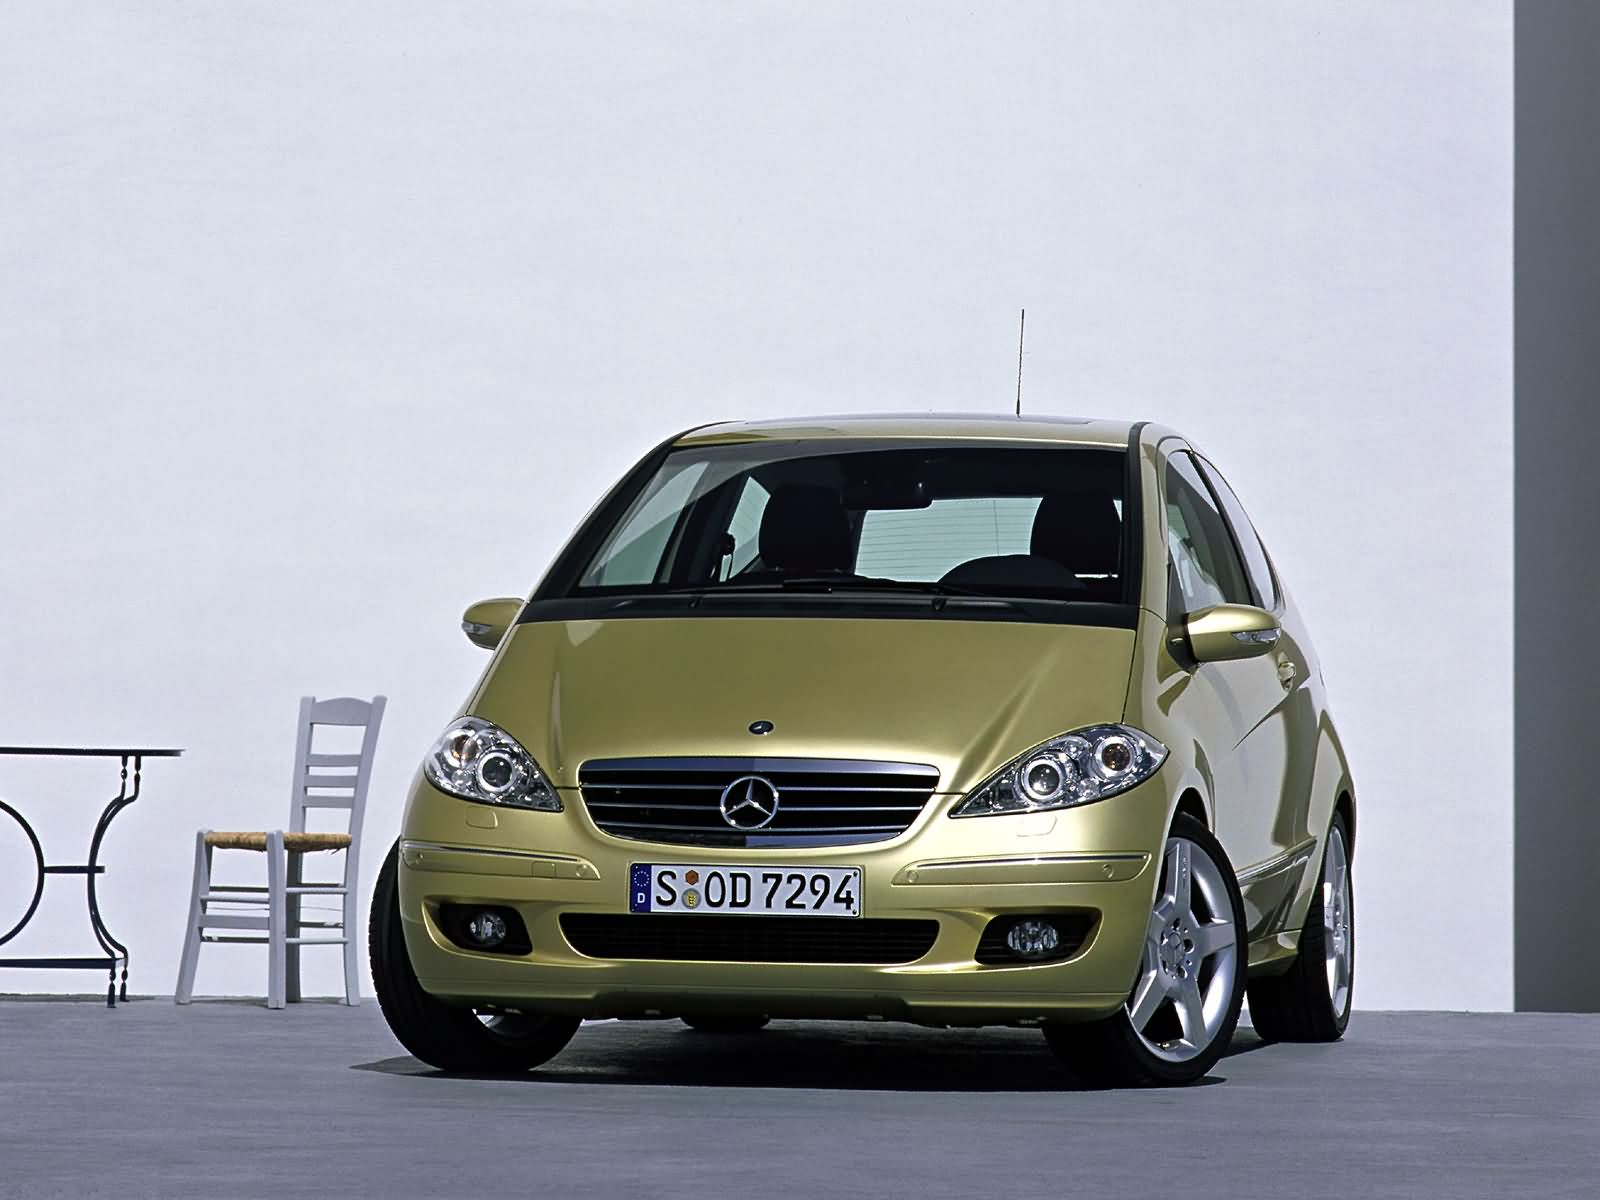 Mercedes benz a200 picture 11937 mercedes benz photo for Mercedes benz a200